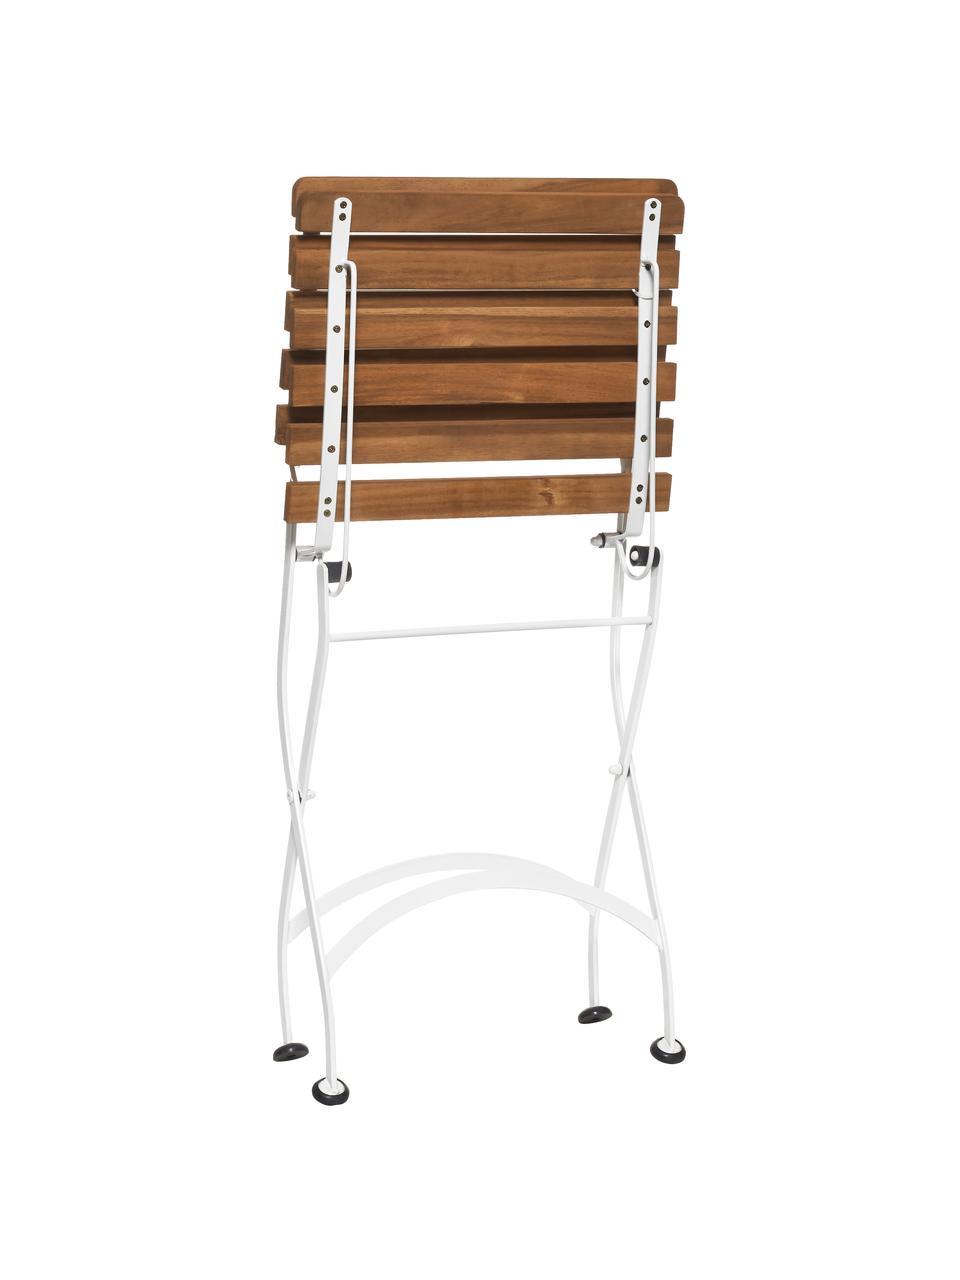 Garten-Klappstühle Parklife, 2 Stück, Sitzfläche: Akazienholz, geölt, Gestell: Metall, verzinkt, pulverb, Weiß, Akazienholz, B 47 x T 59 cm